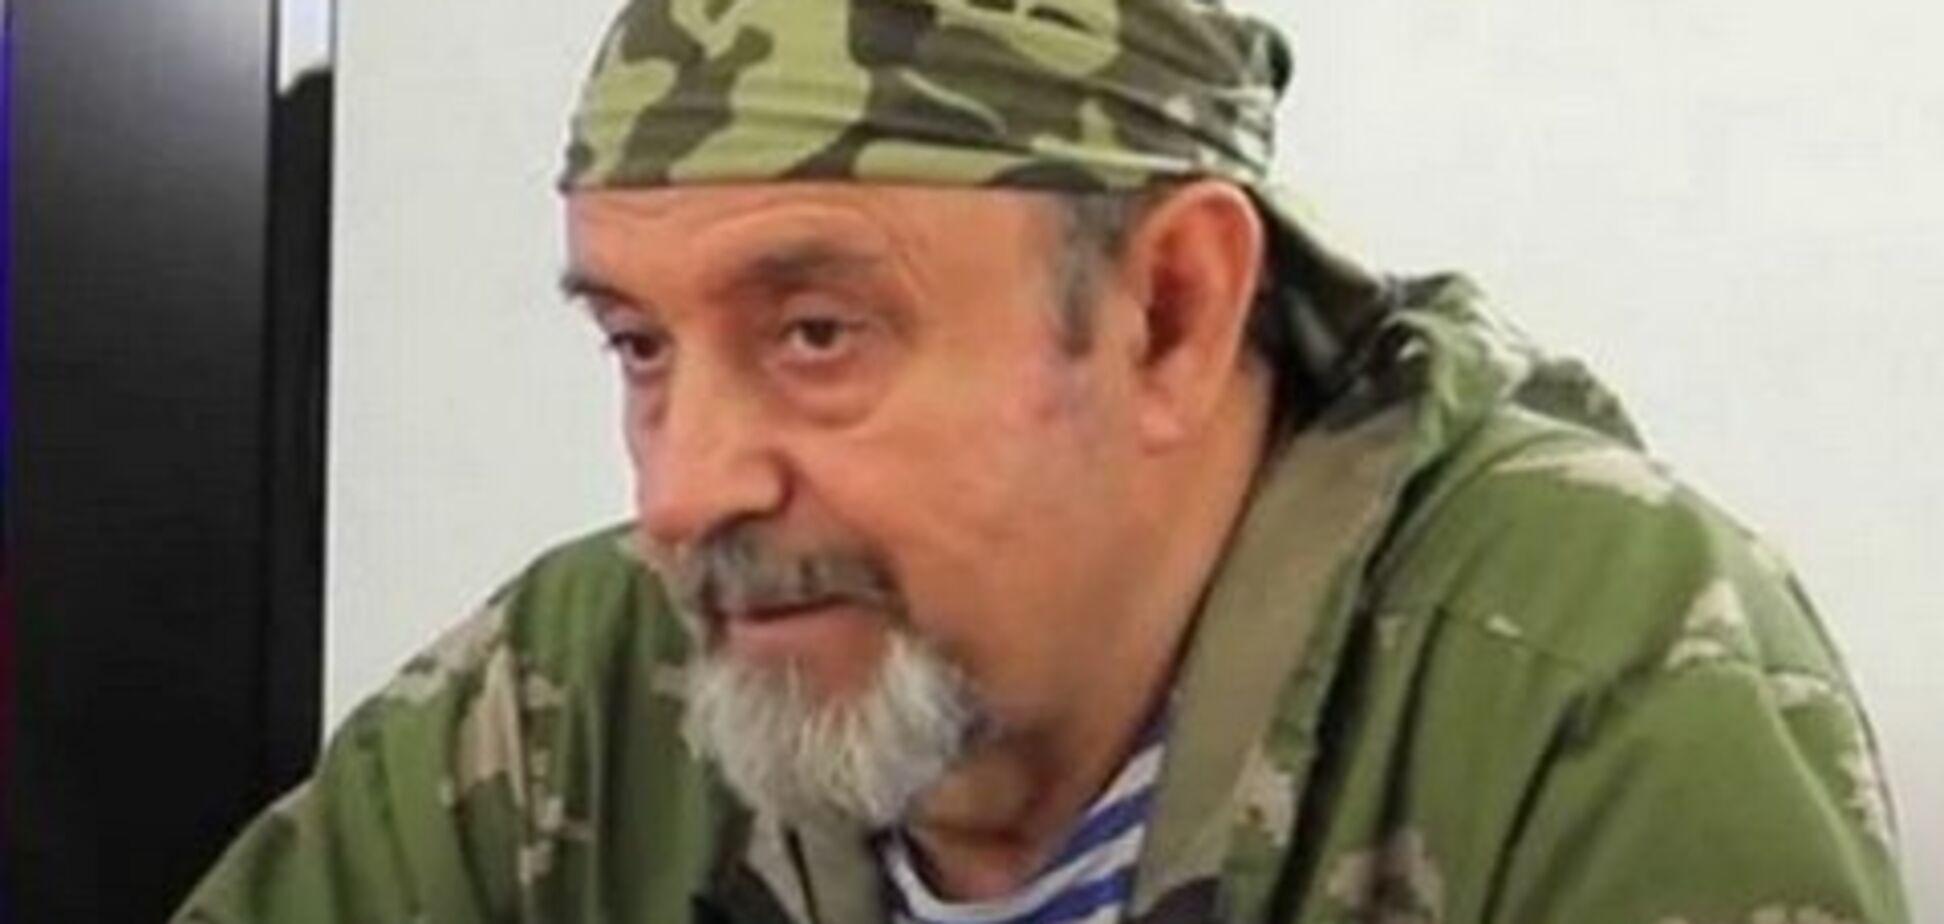 Дело МН17: укравший трейлер для перевозки 'Бука' террорист вышел на свободу